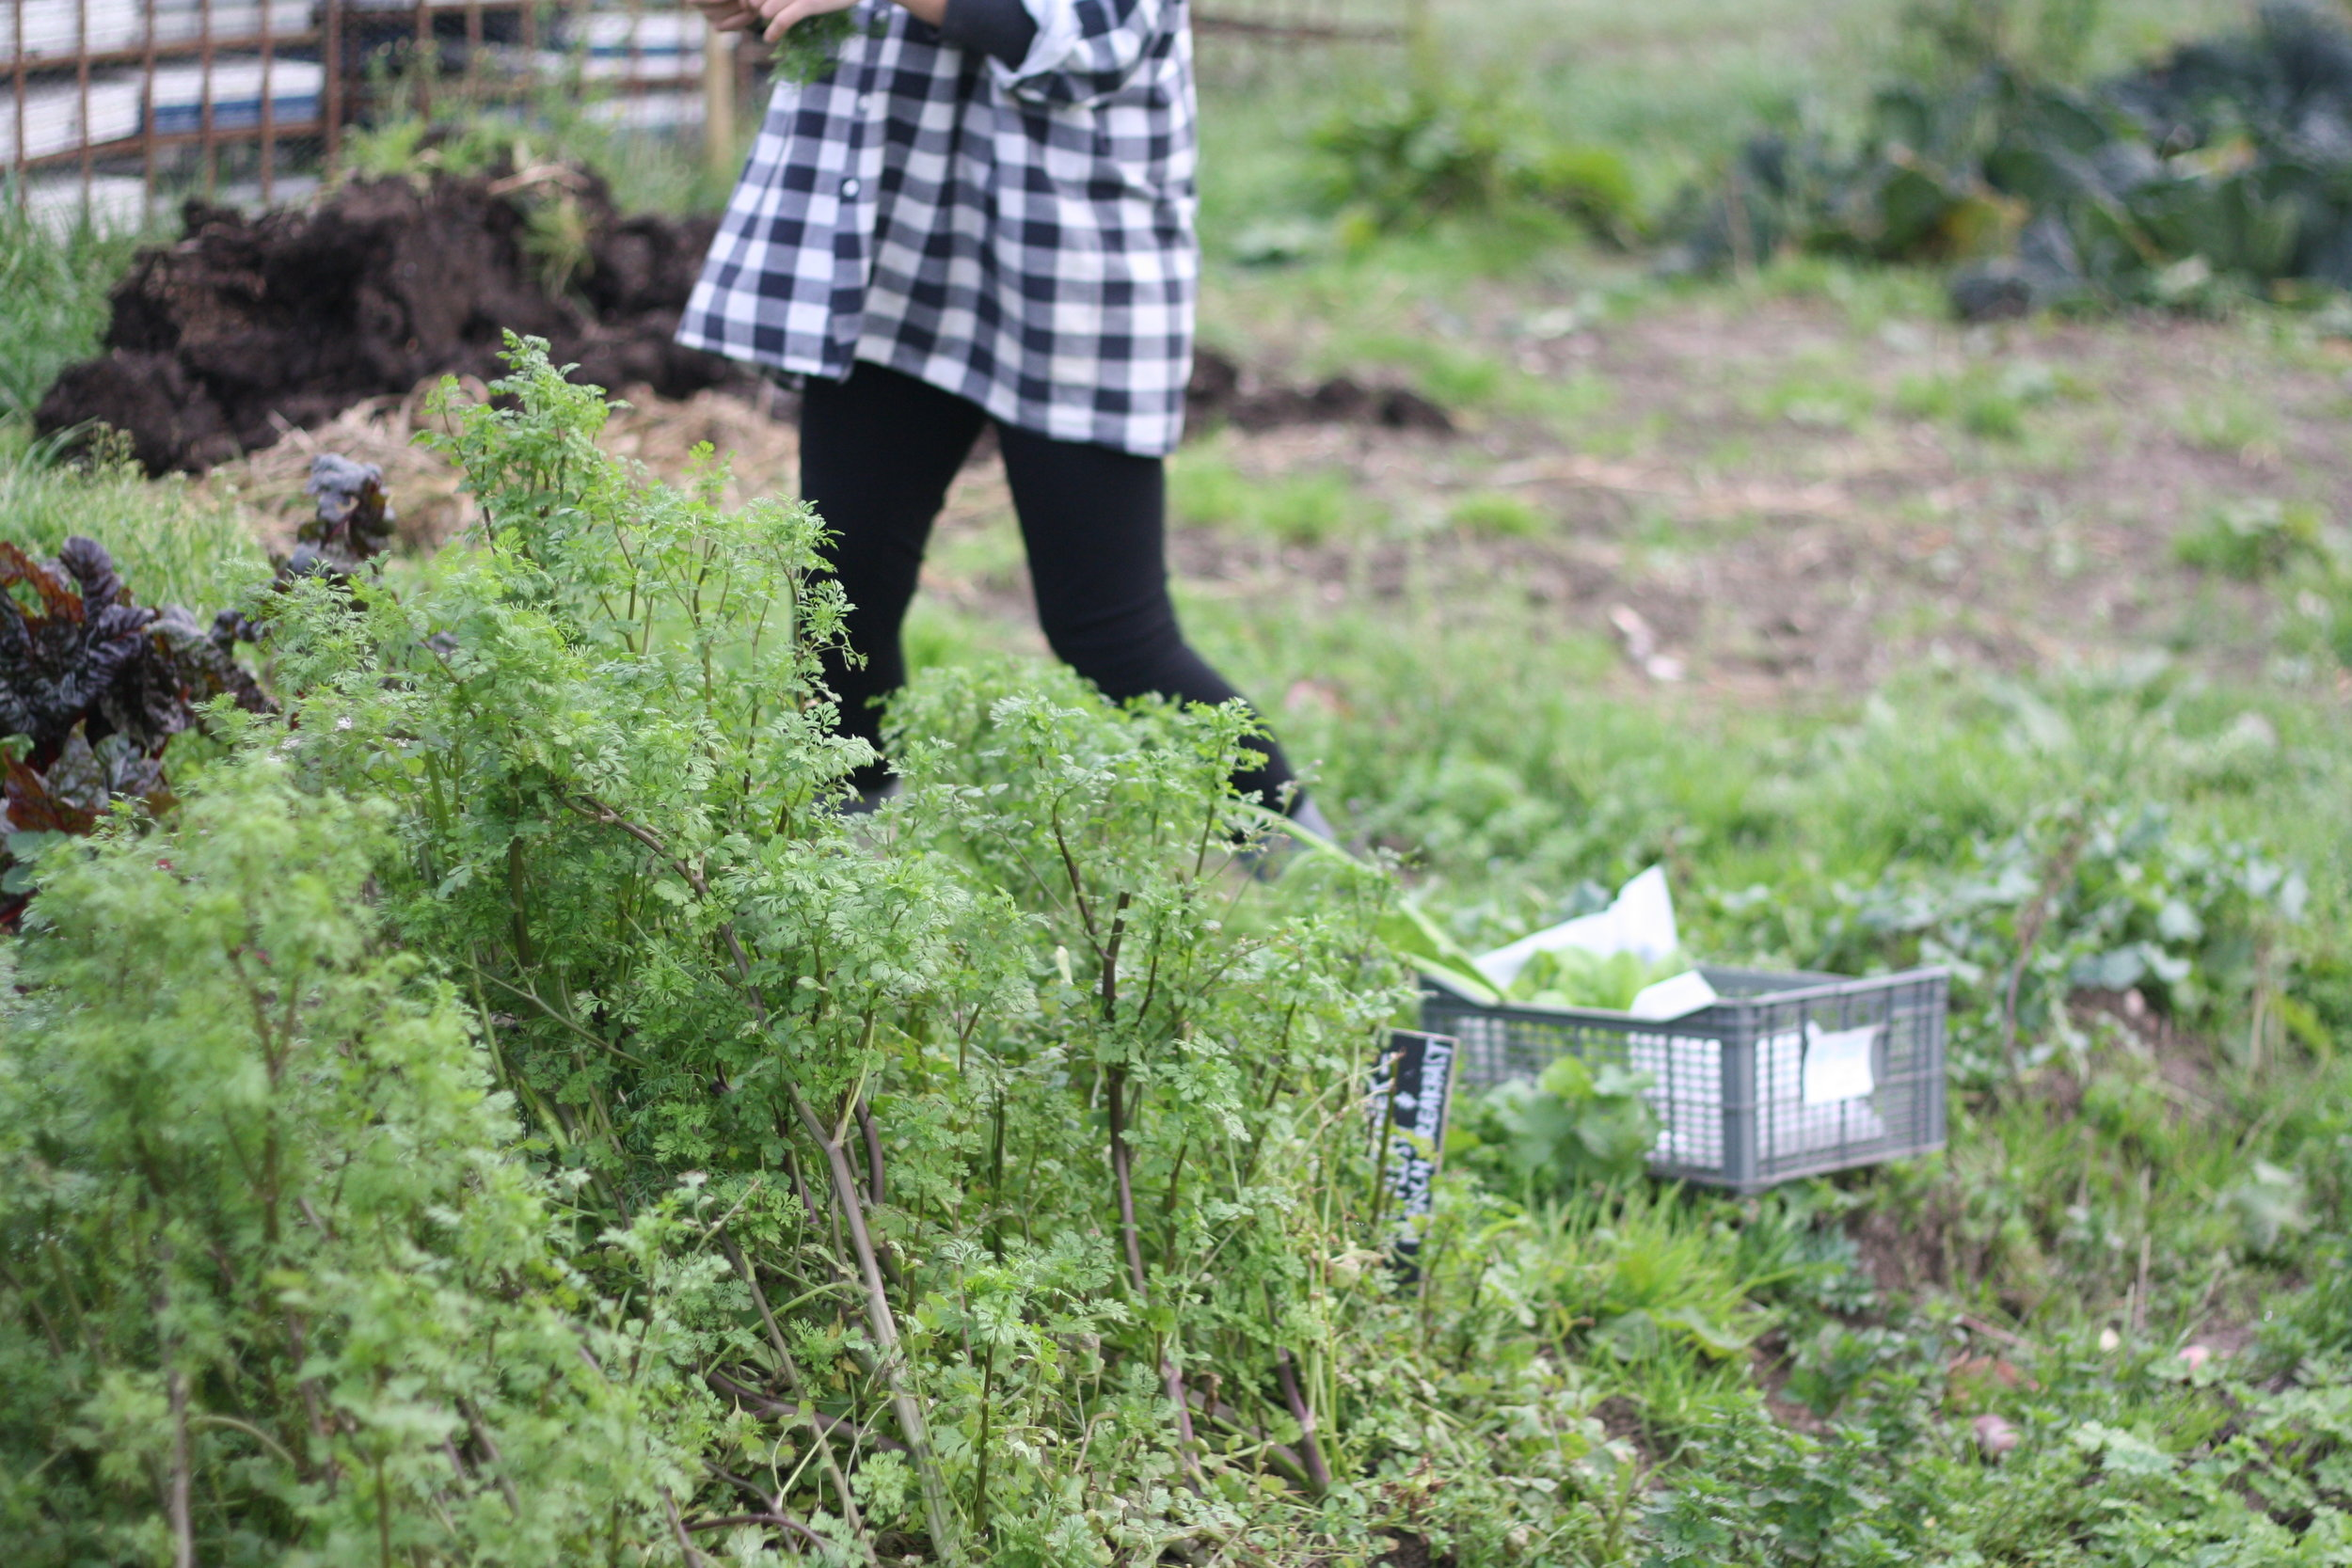 A Woven Plane – socks for women - journal – One Field Farm, farming in check print dress